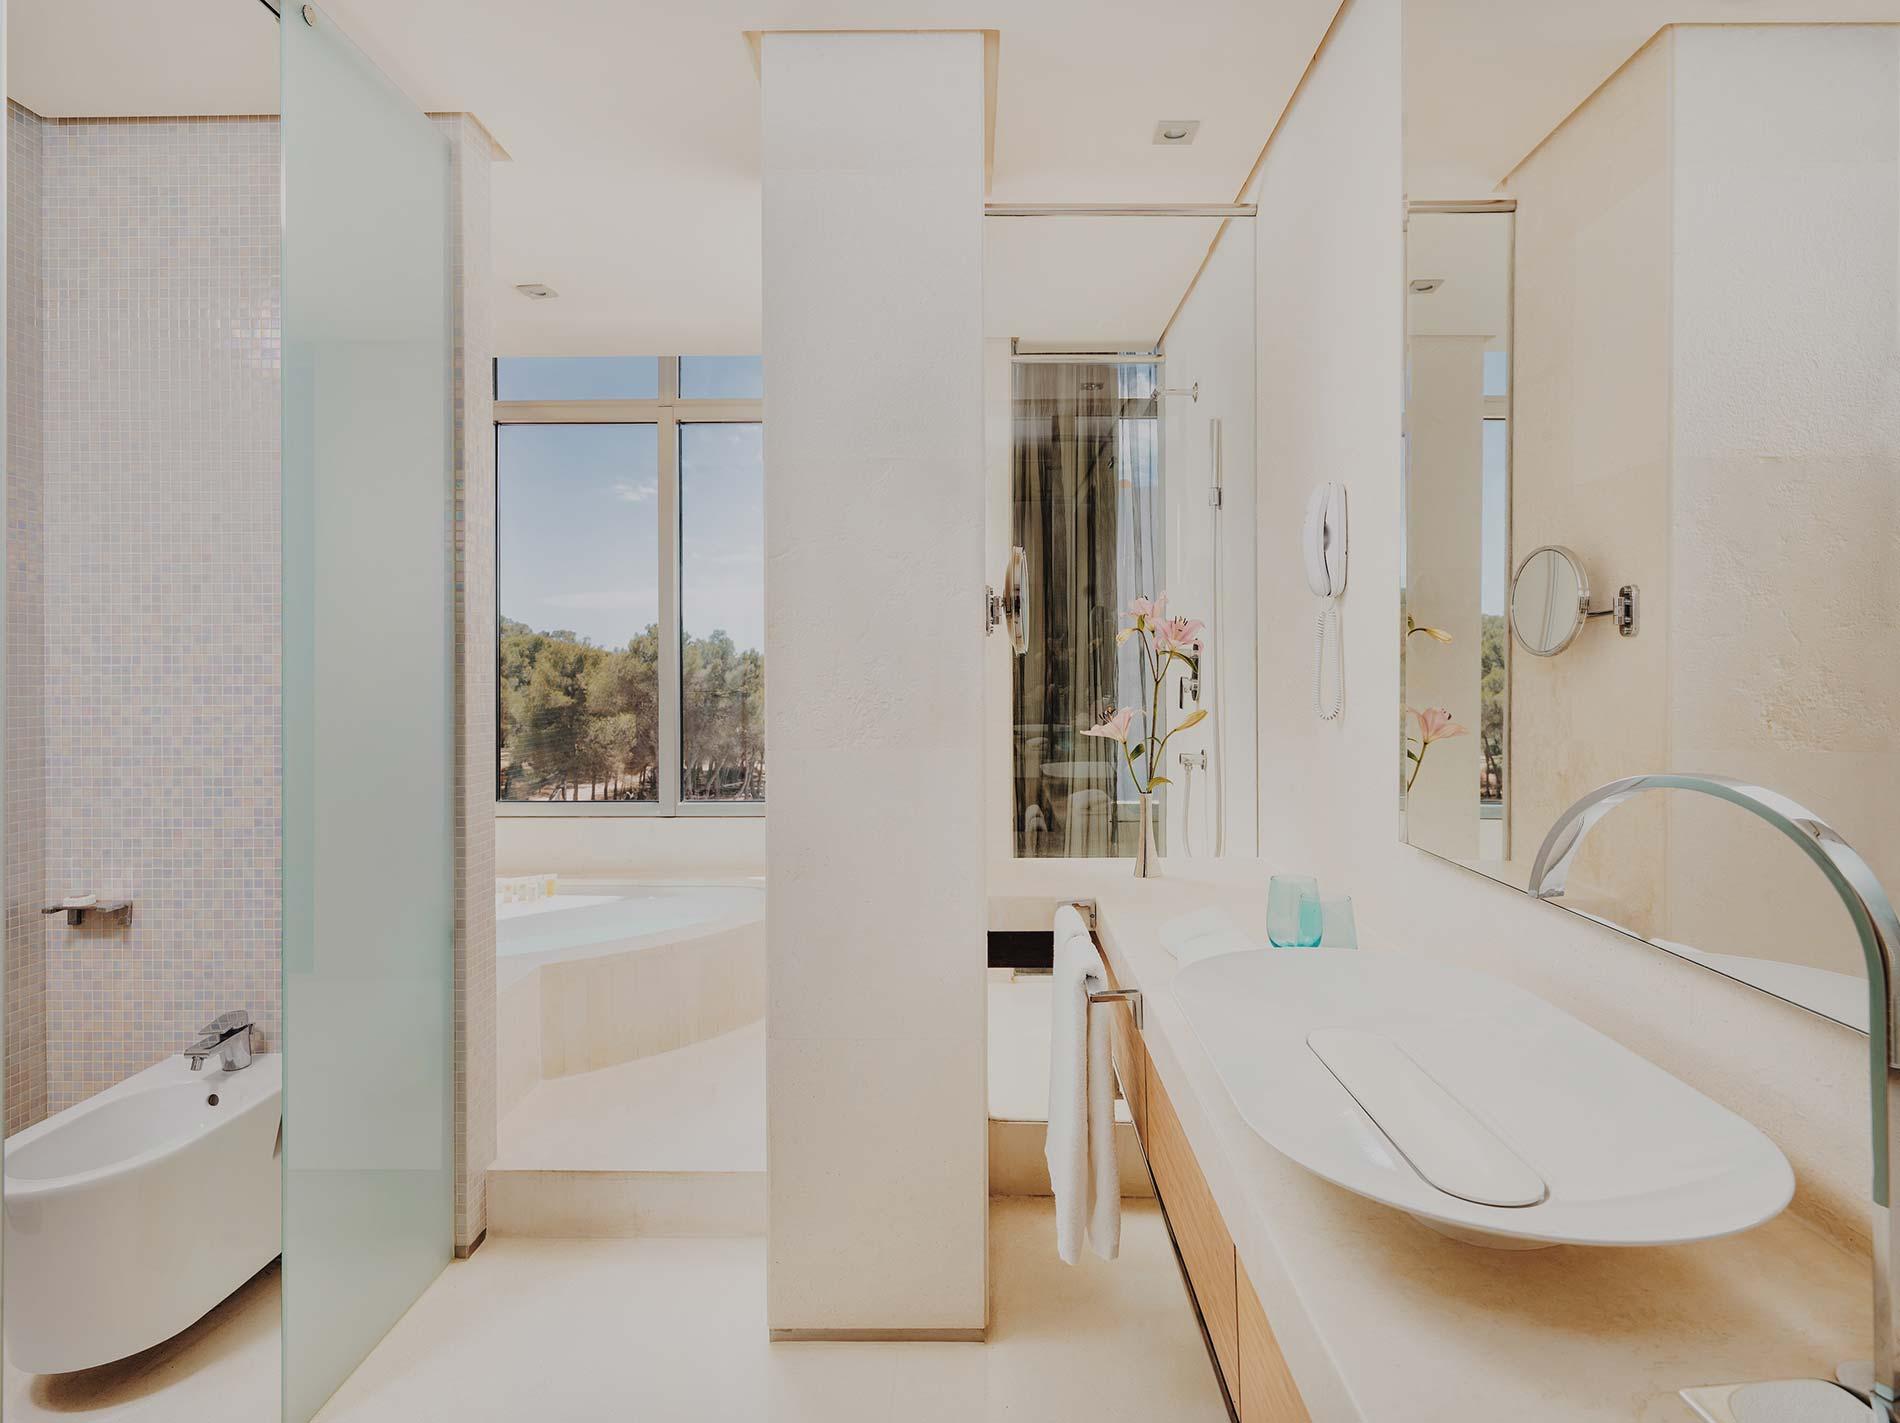 aguasdeibiza-habitacion-corner-suite-002-w1